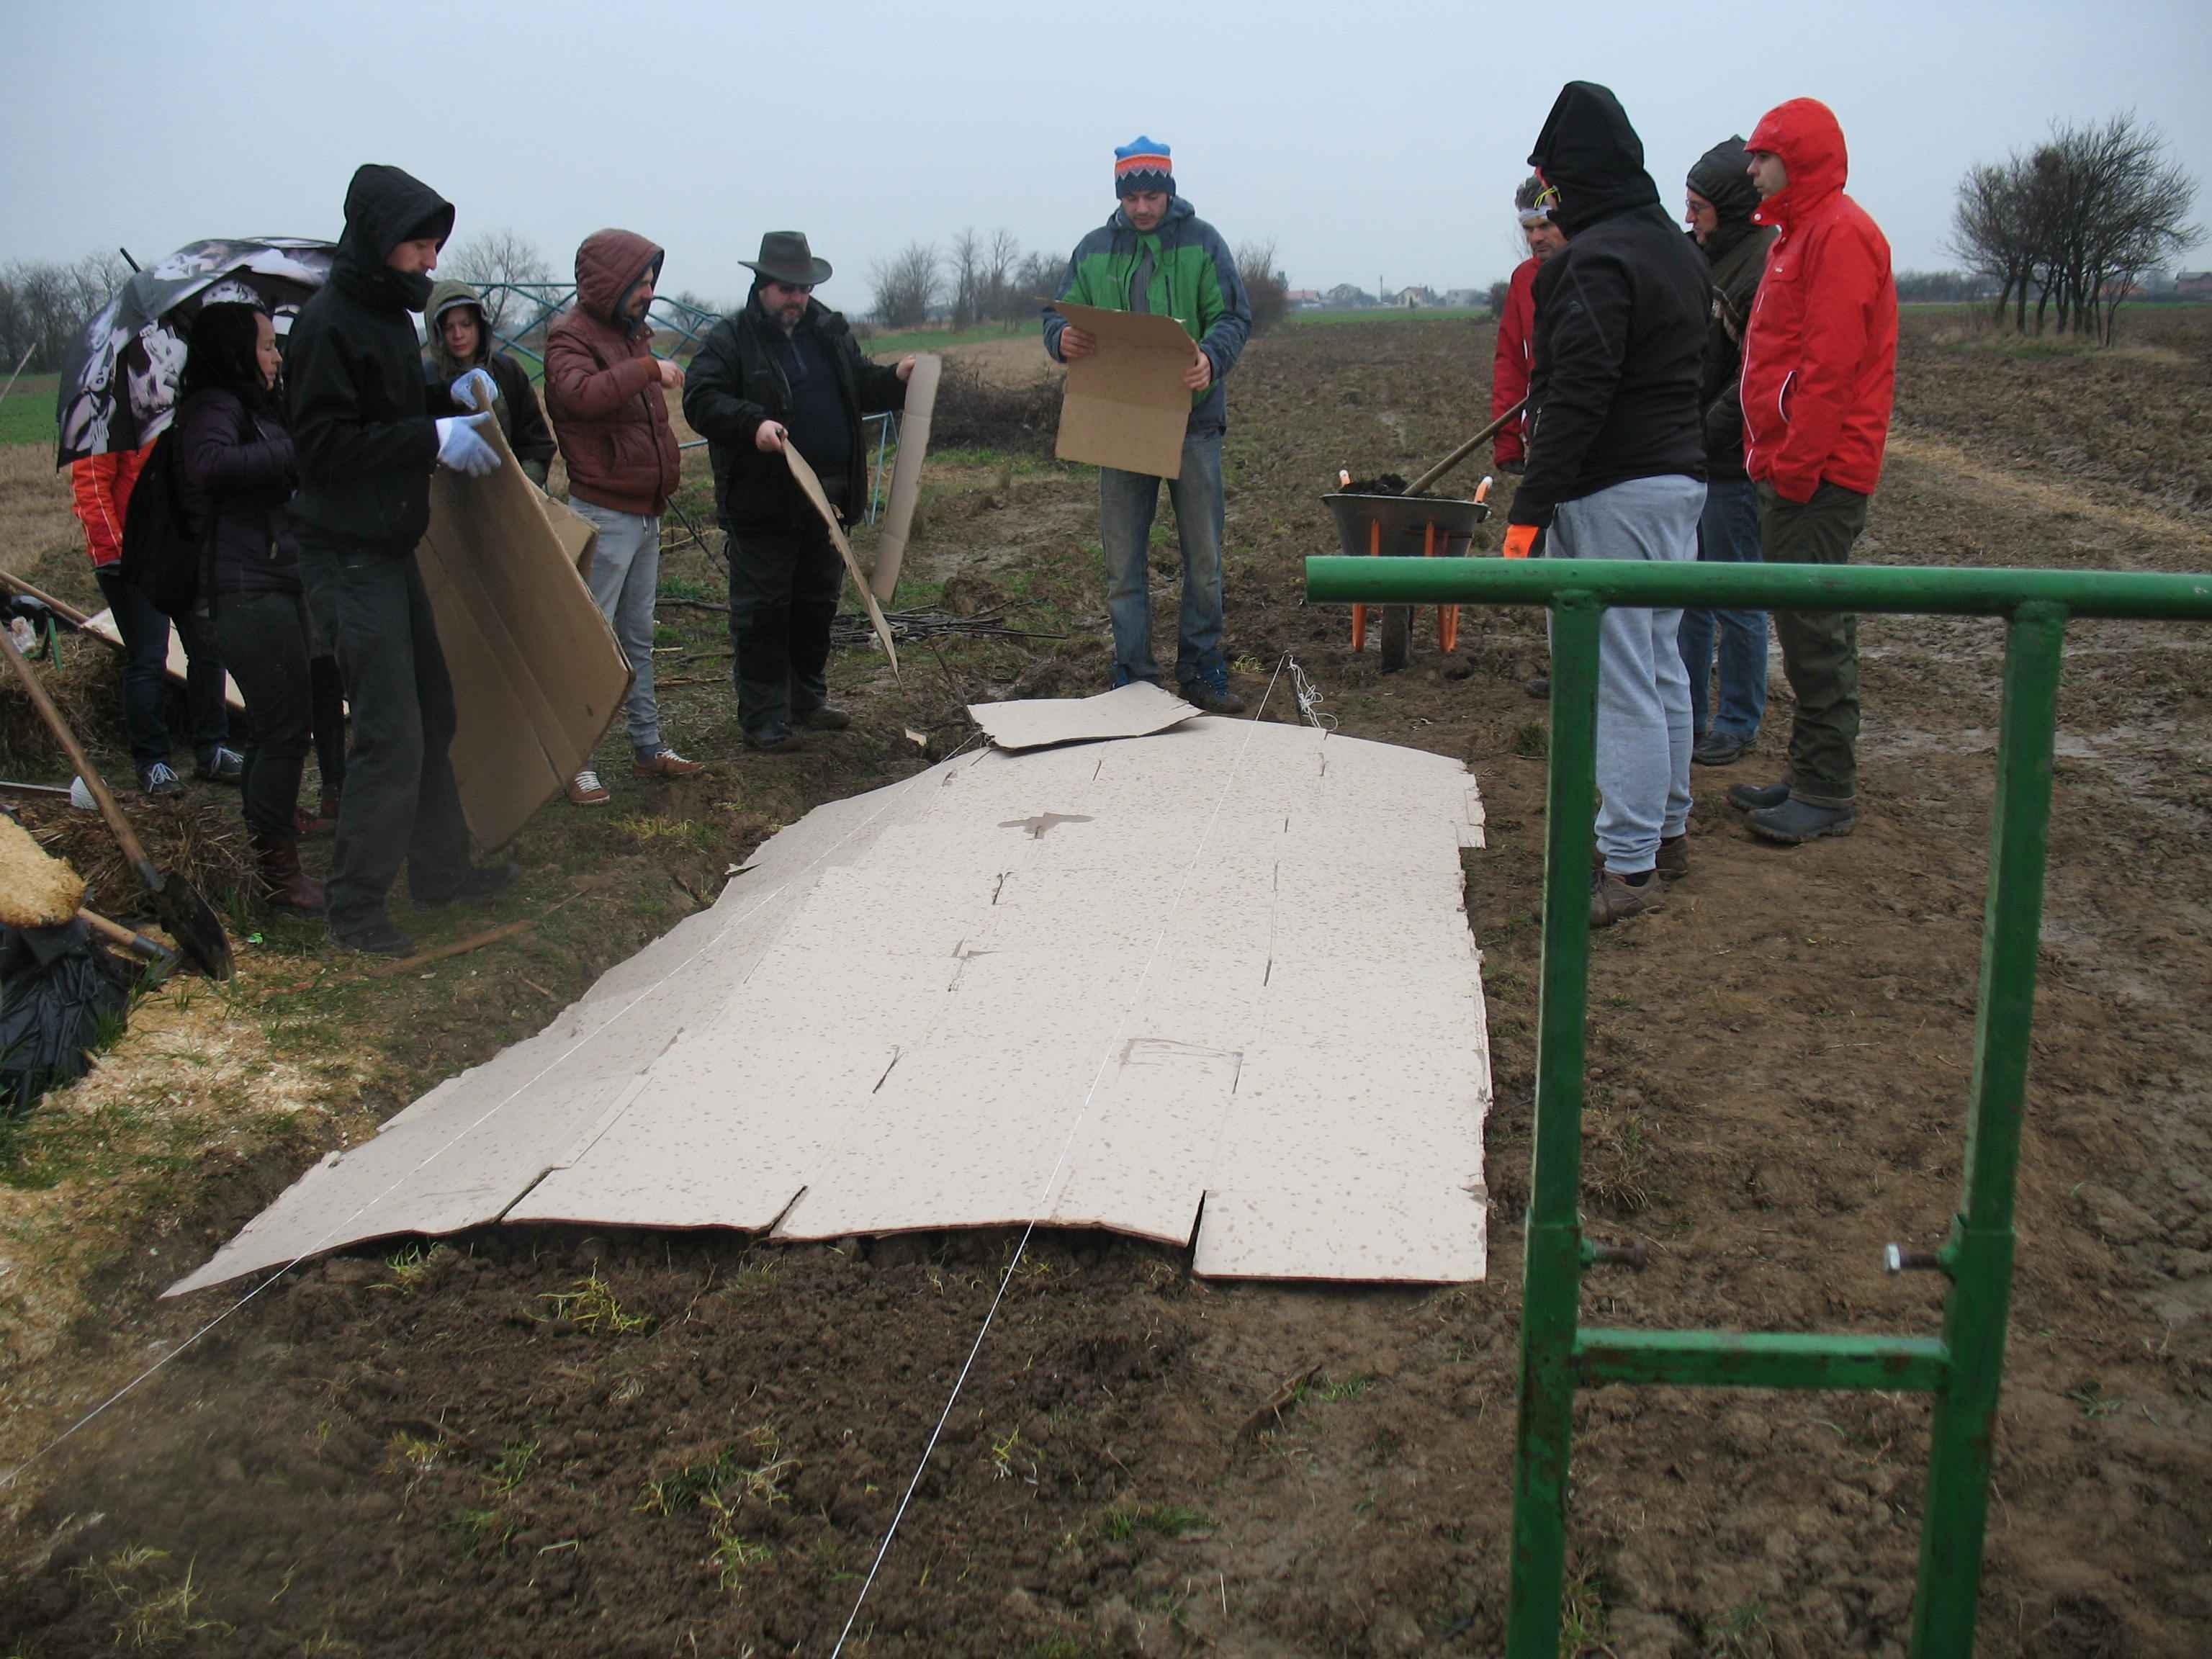 Gradina de permacultura - intinderea cartoanelorGradina de permacultura - intinderea cartoanelor